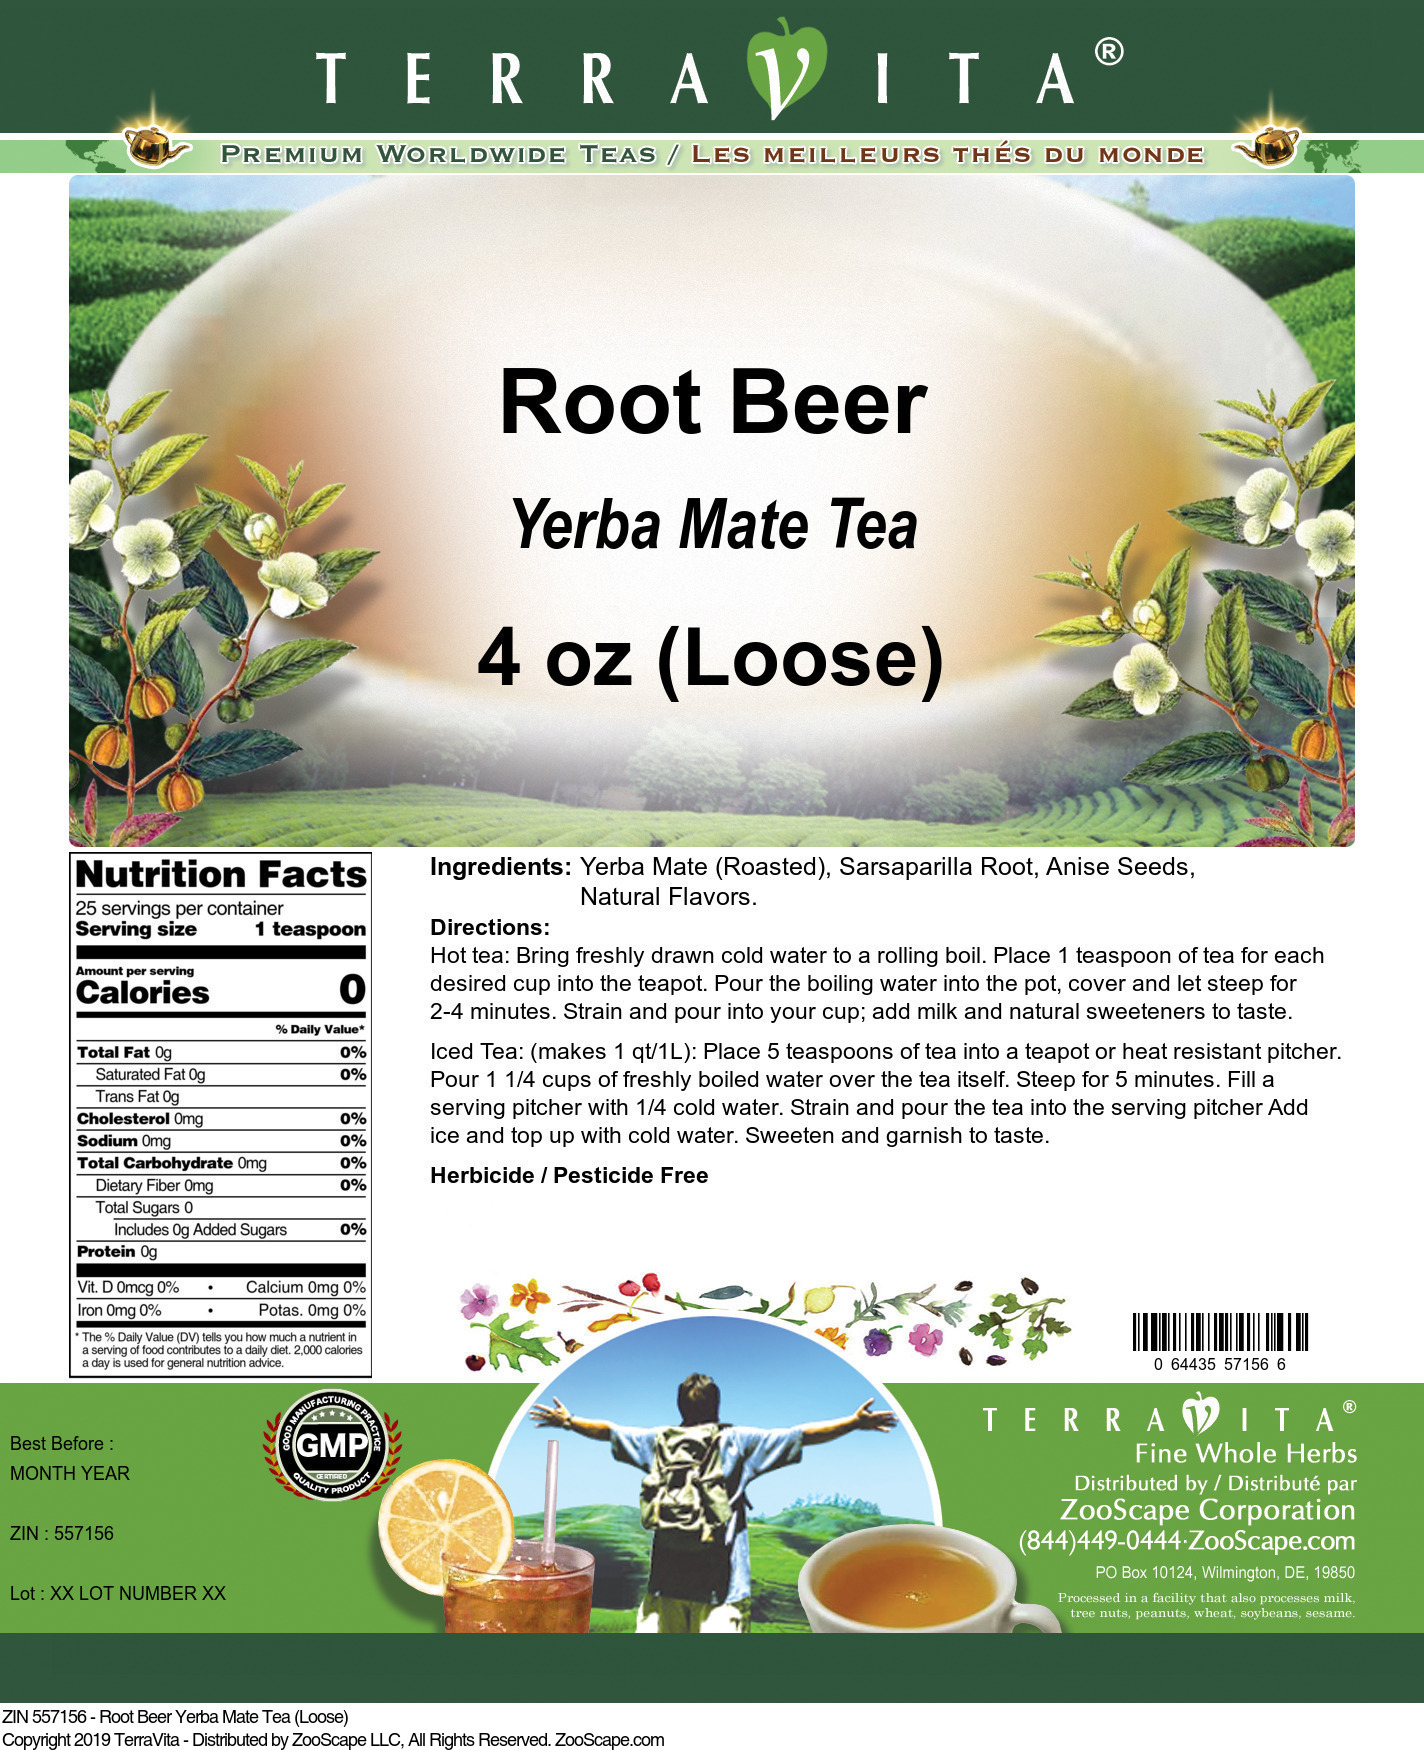 Root Beer Yerba Mate Tea (Loose)